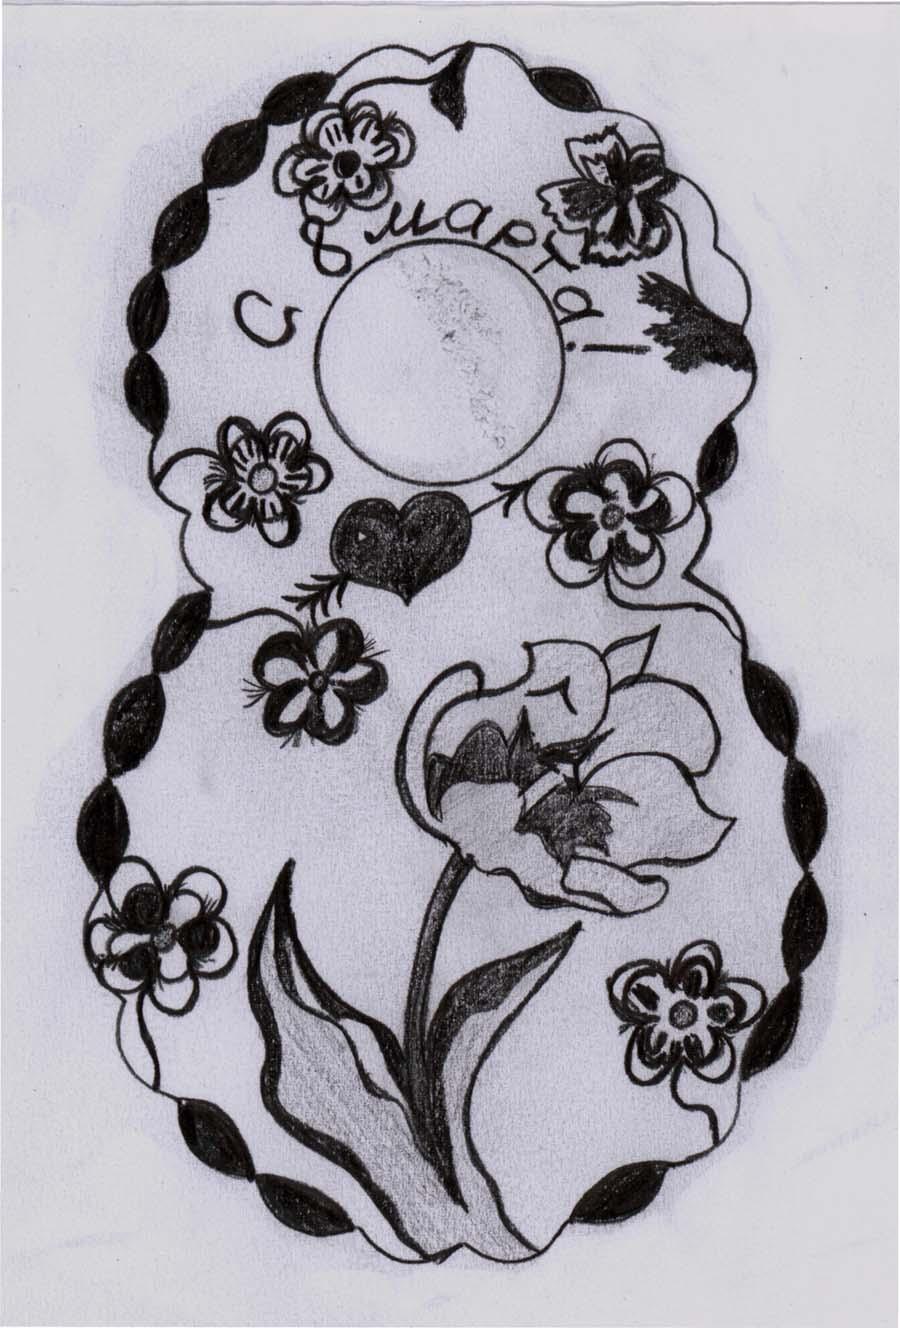 Мои рисунки к моим стихотворениям: www.kate-skiba.narod.ru/figures.html